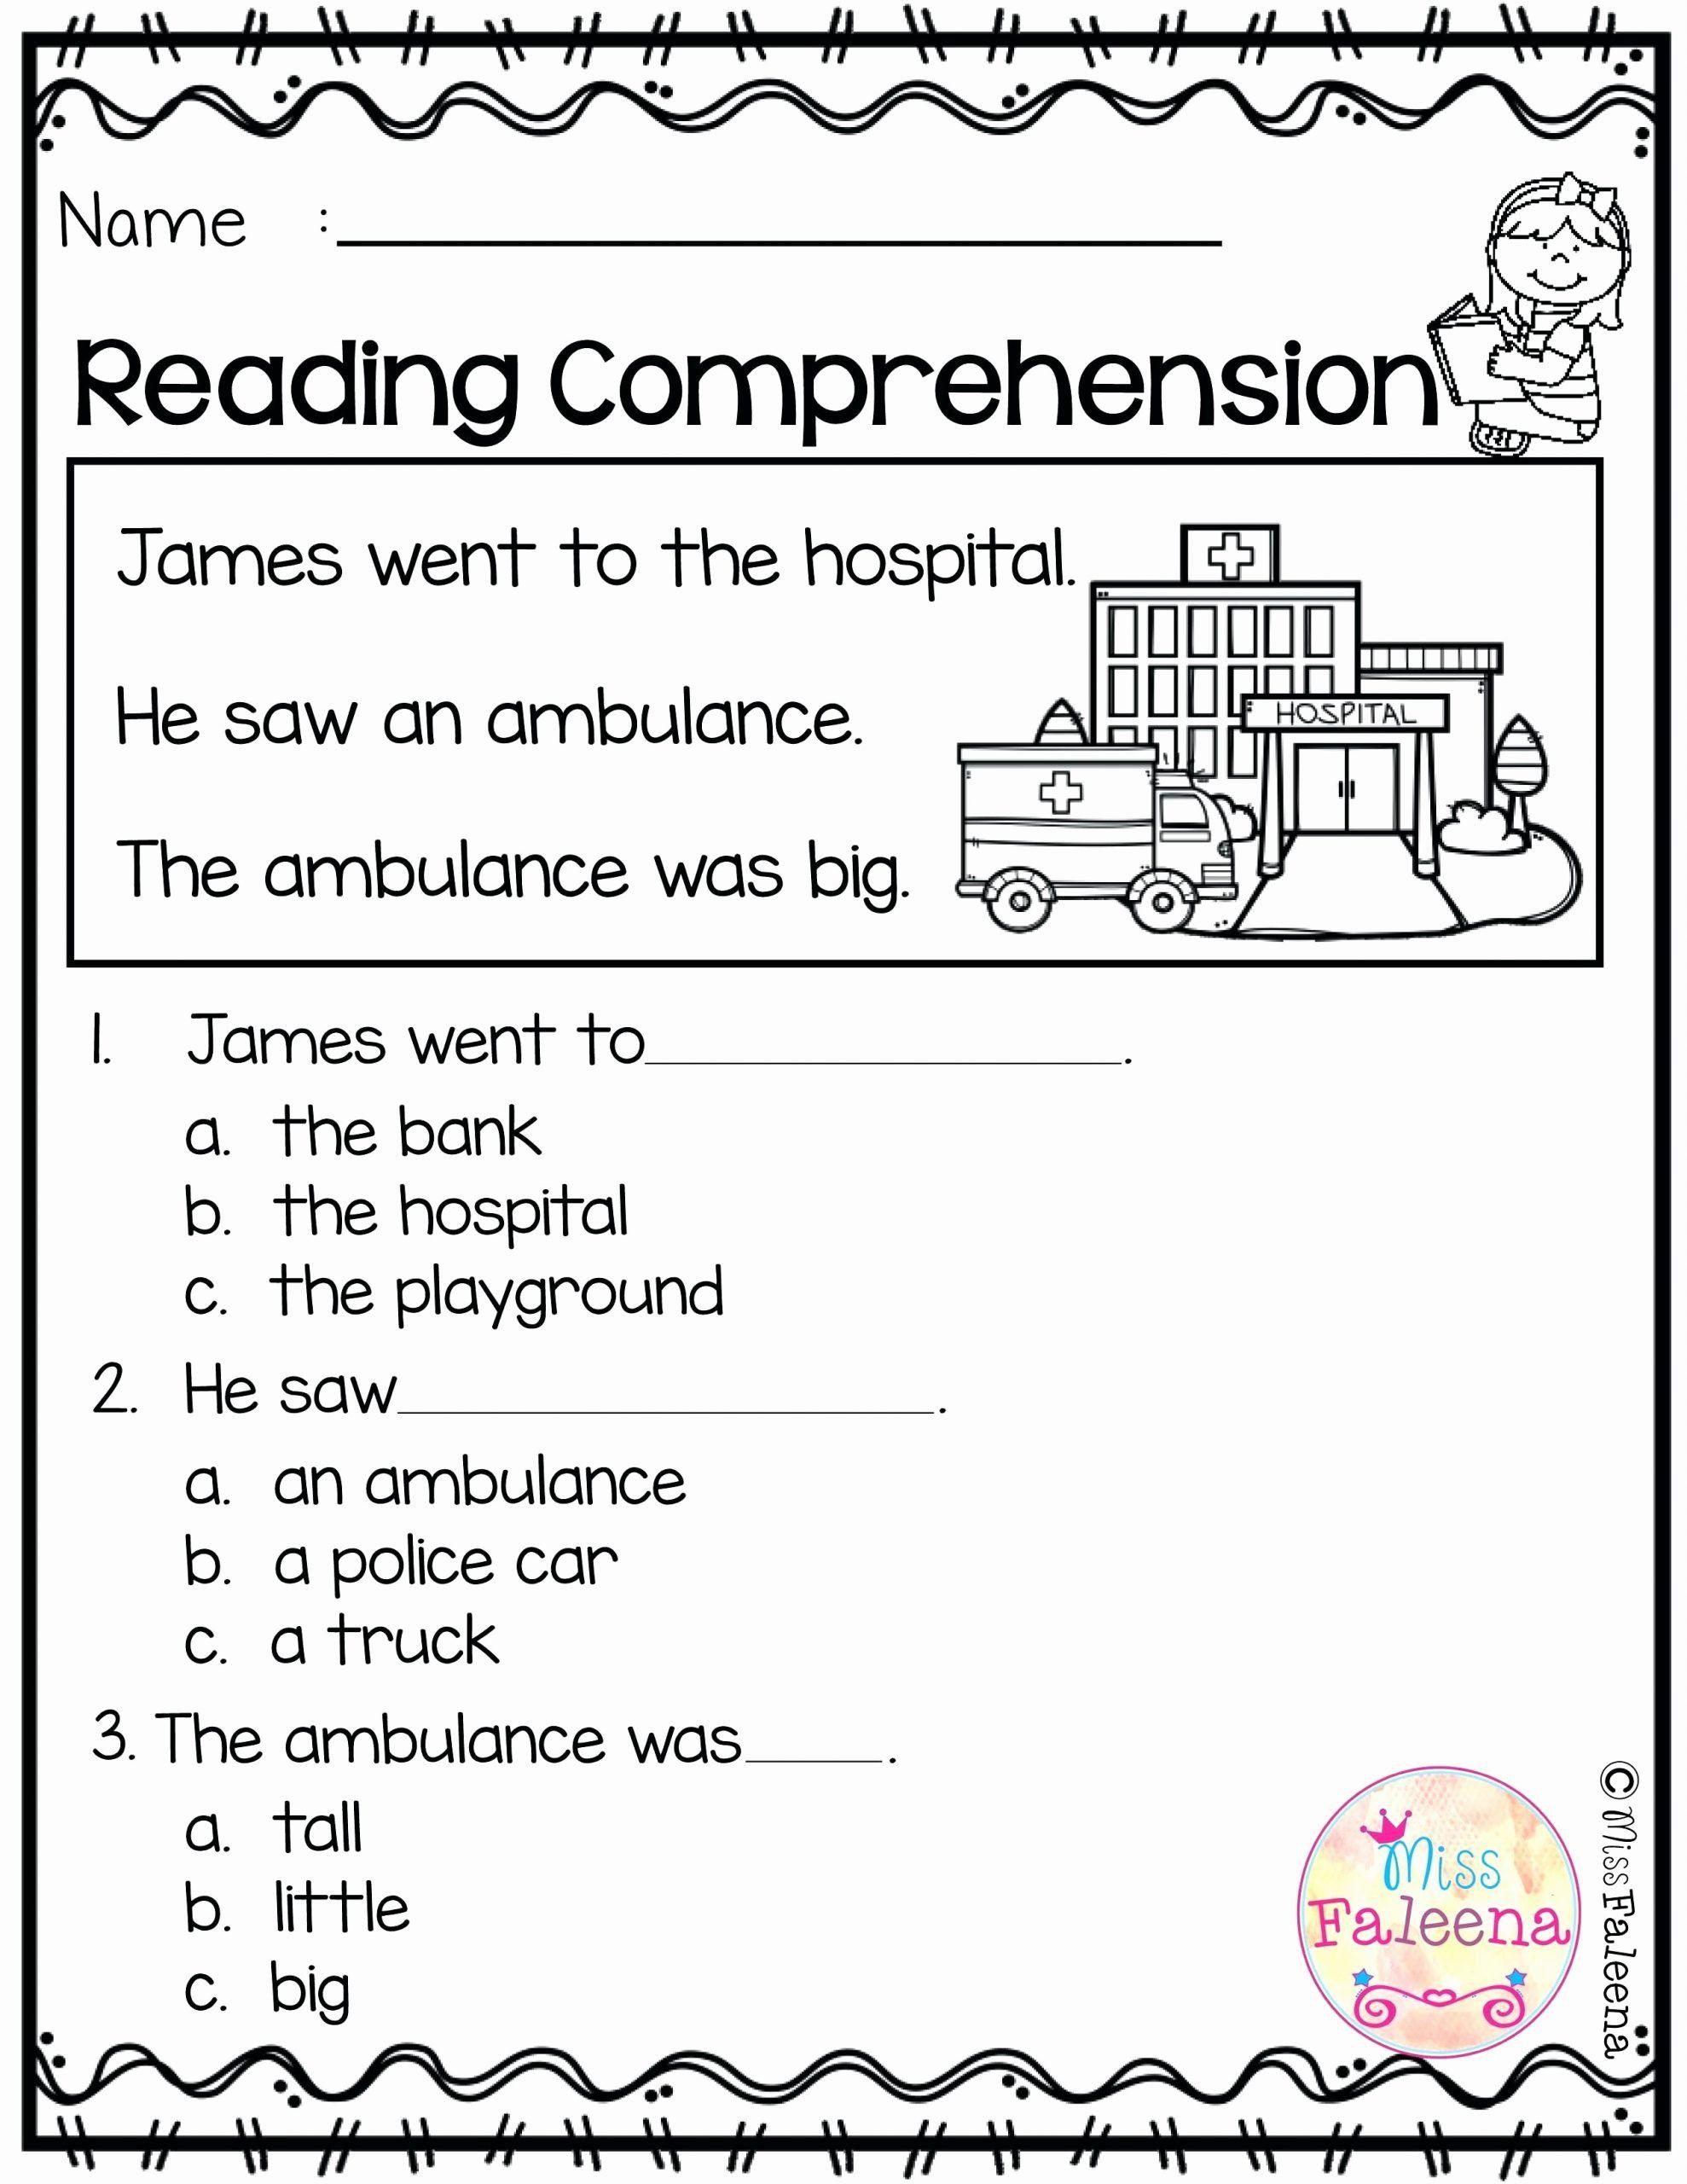 Kindergarten Reading Comprehension Worksheet In